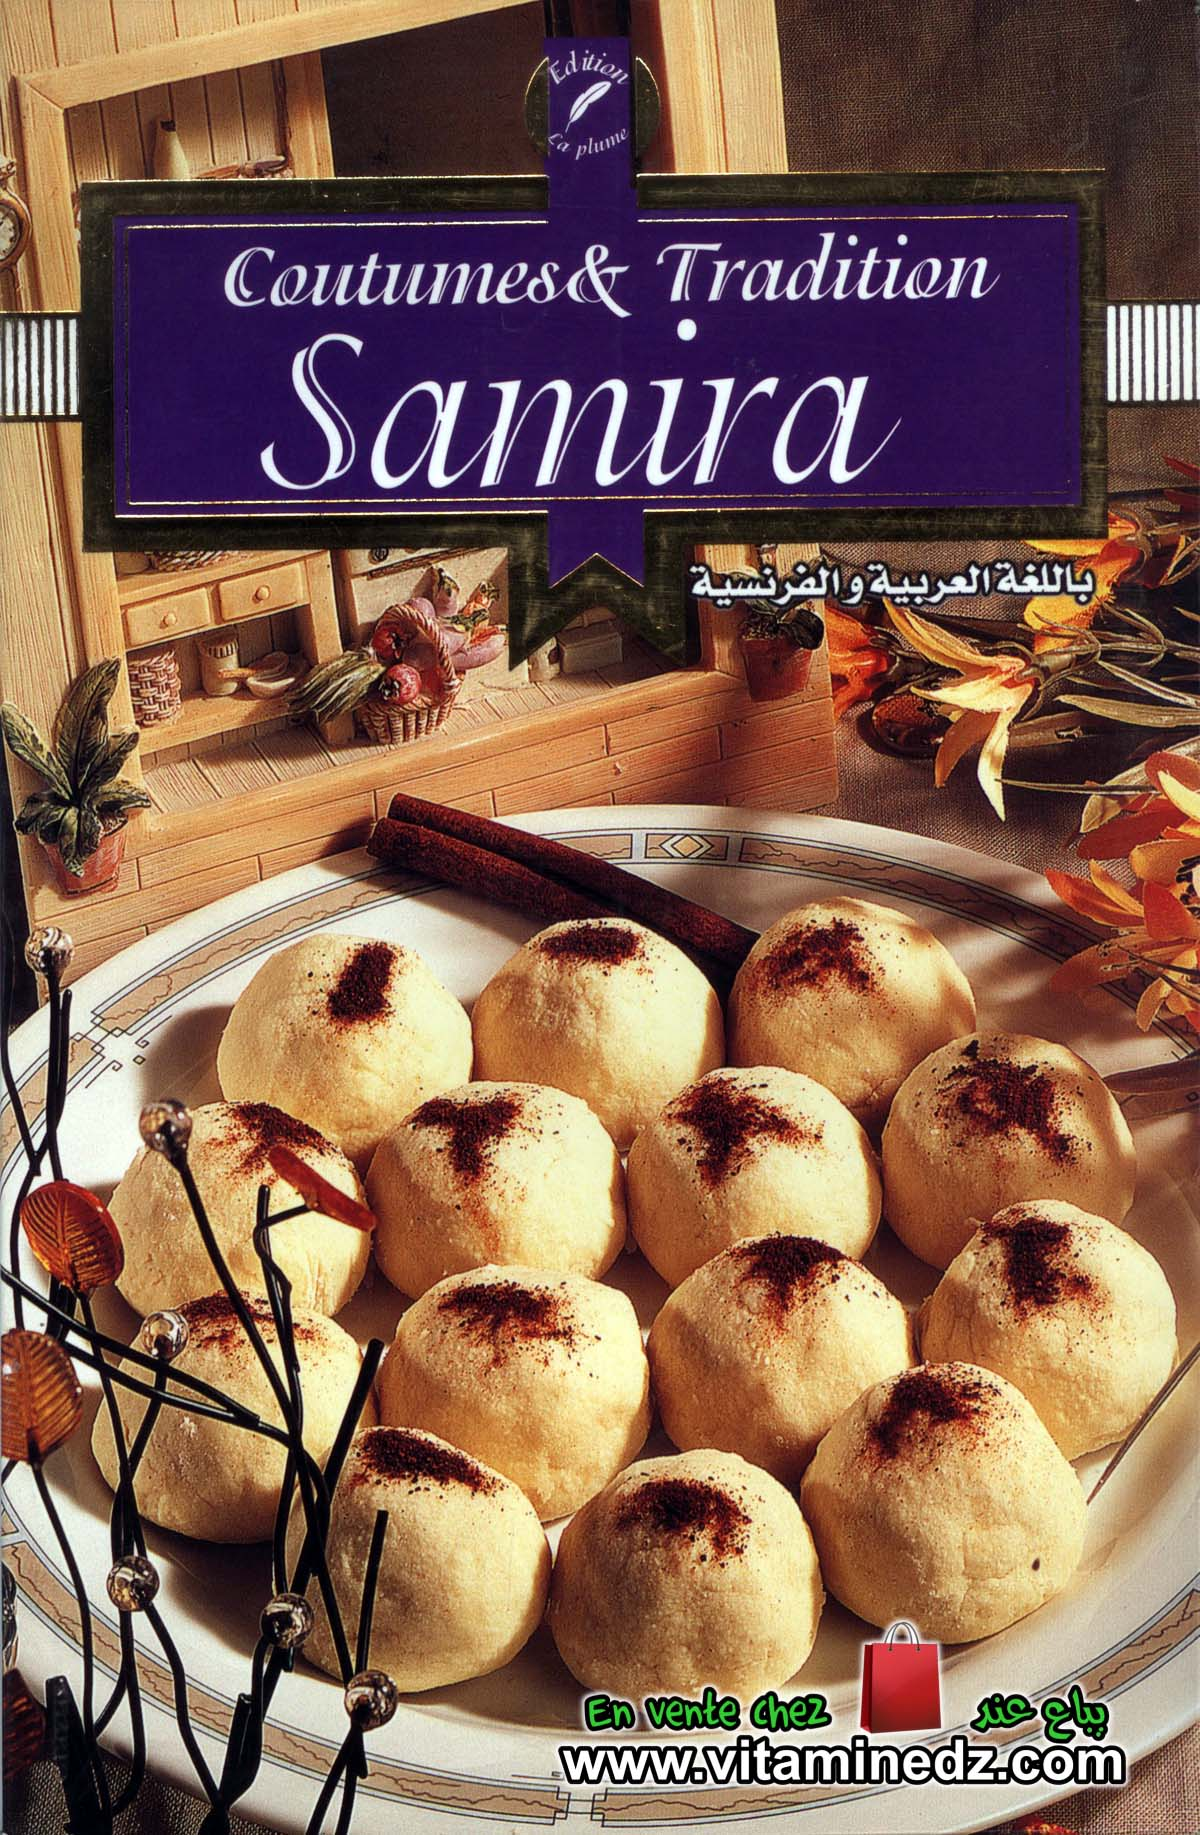 Samira - Recettes de cuisine